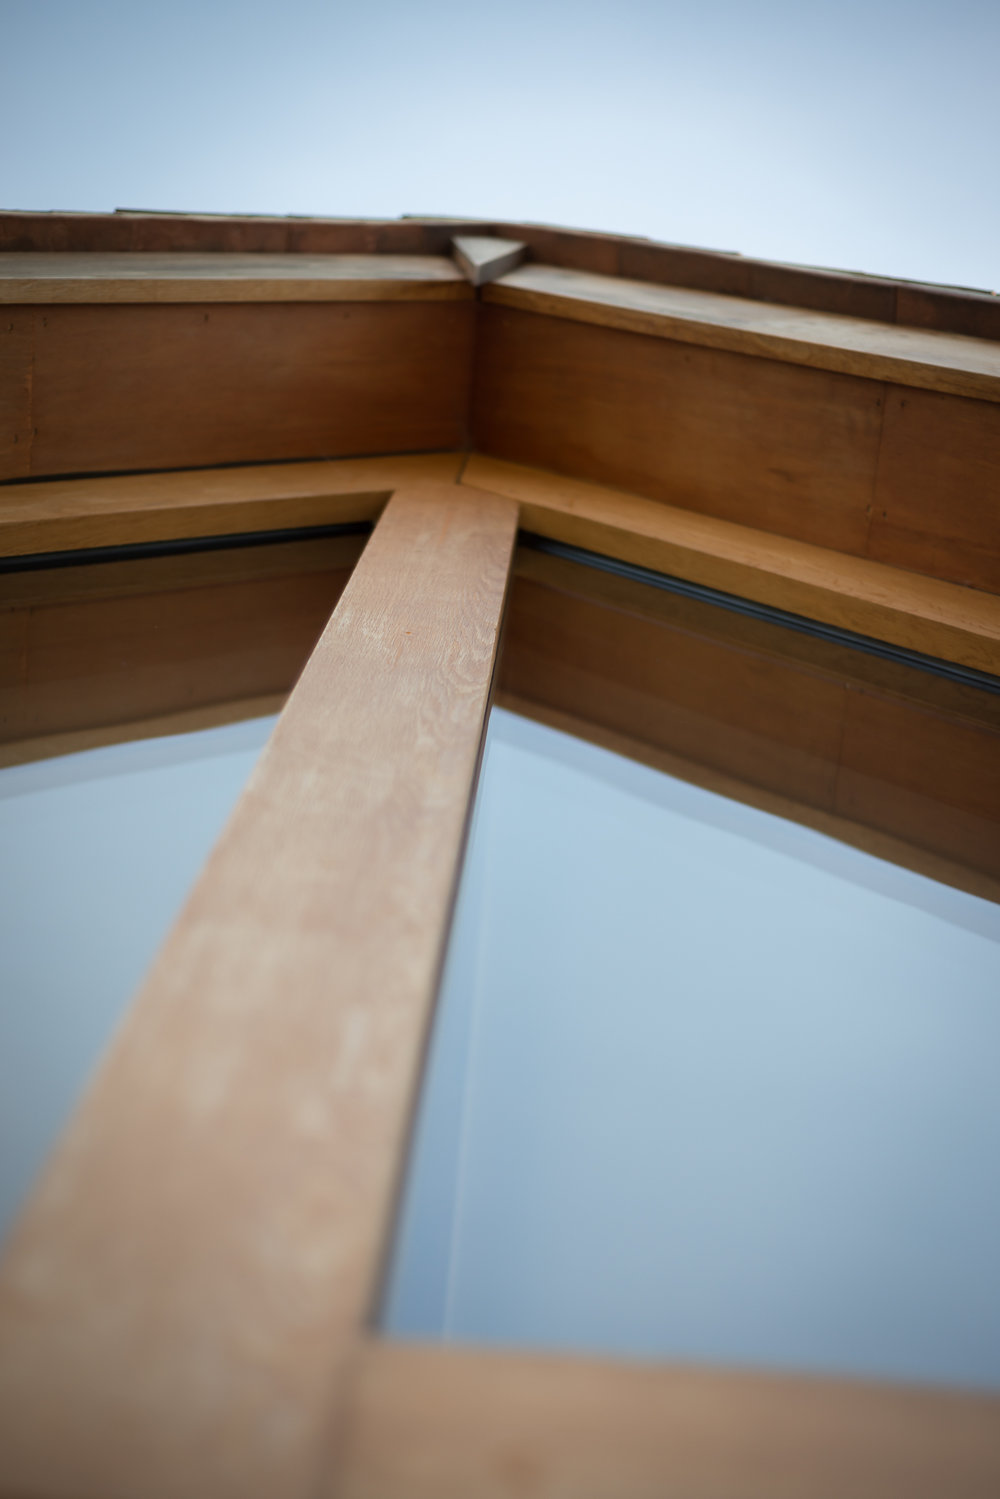 Glulam Timber Frame and Triple Glazed Gable End